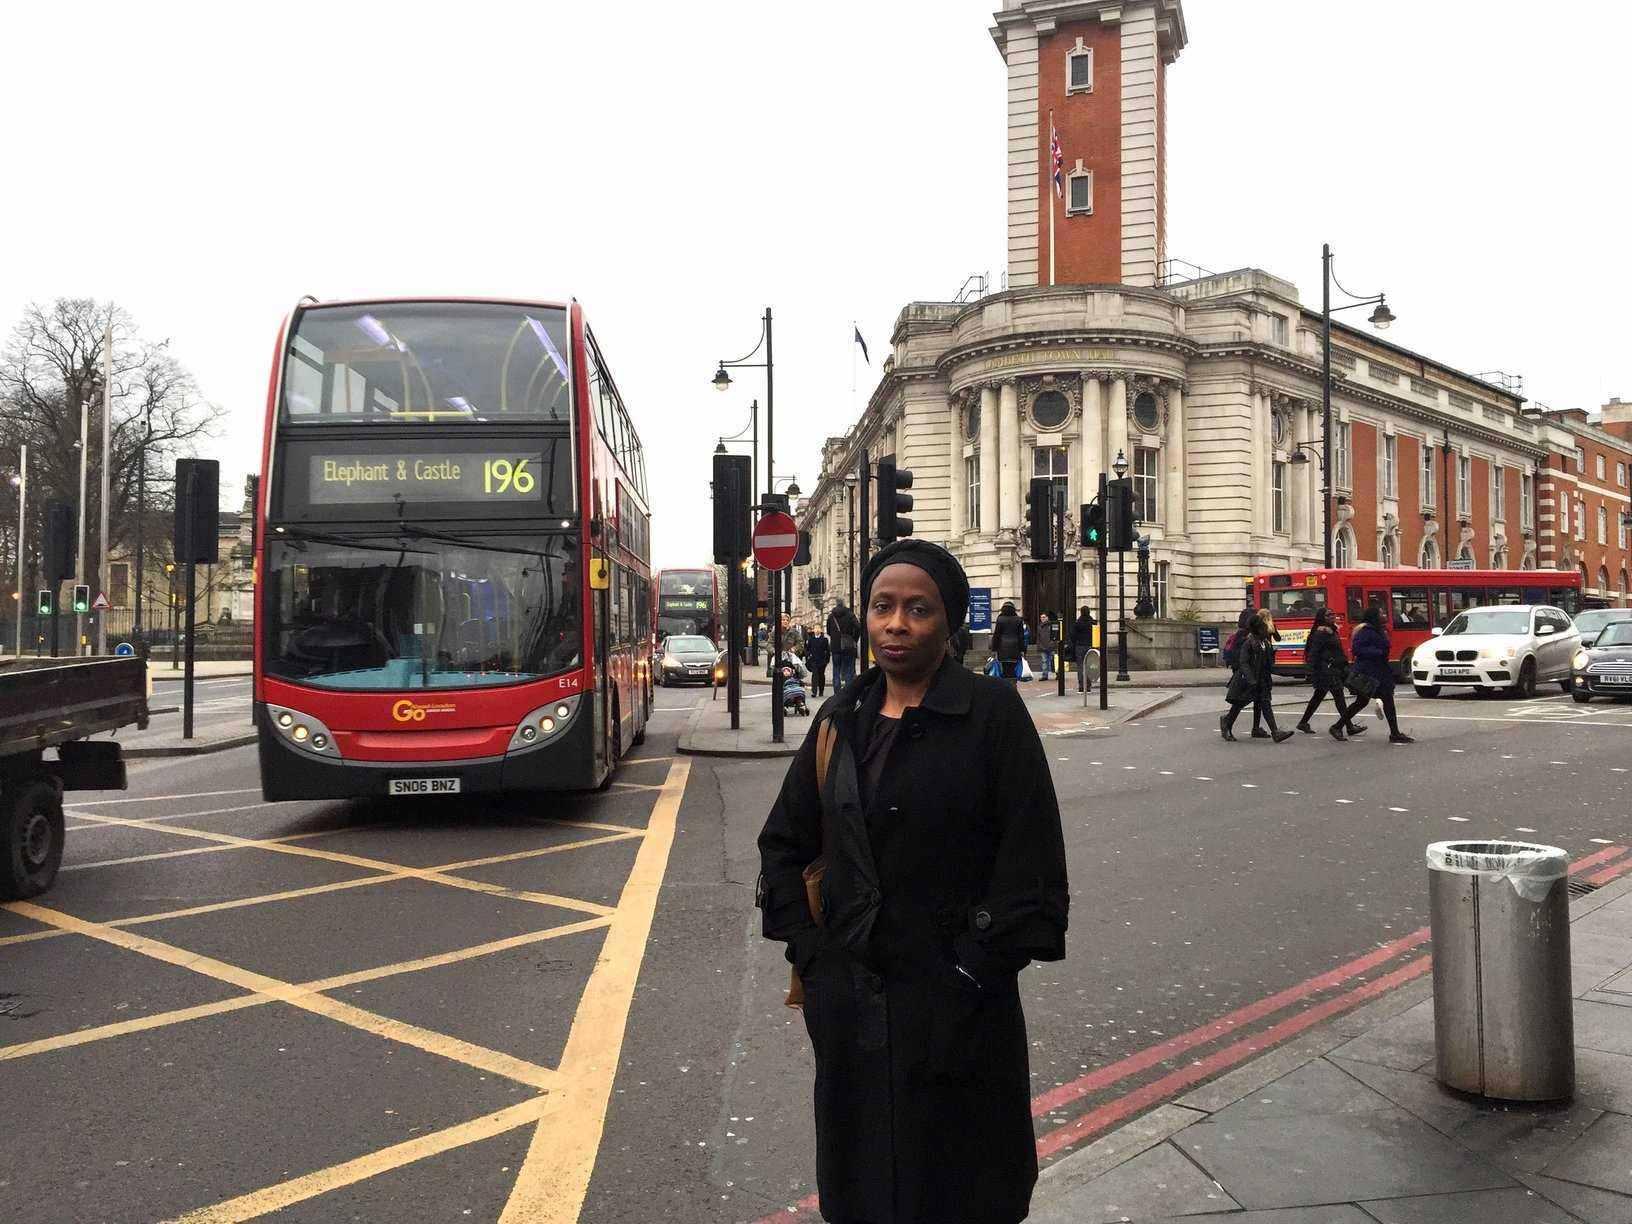 Cllr Jennifer Brathwaite on tackling air pollution in Lambeth